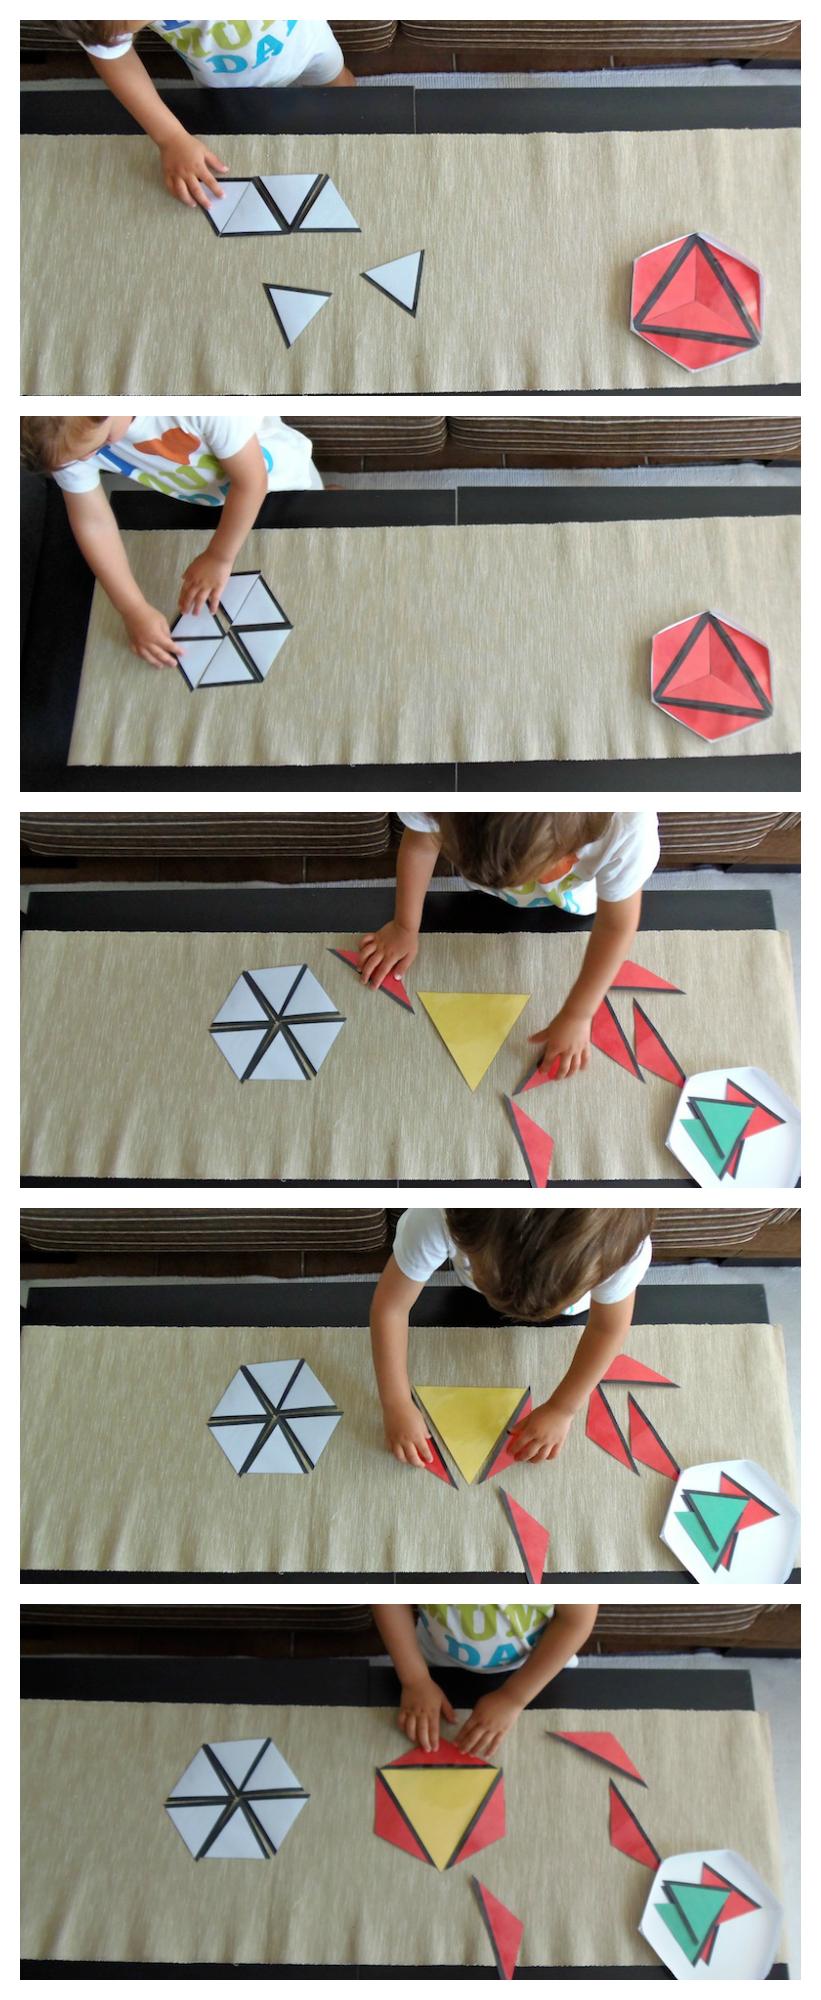 Triangulos Constructores Montessori